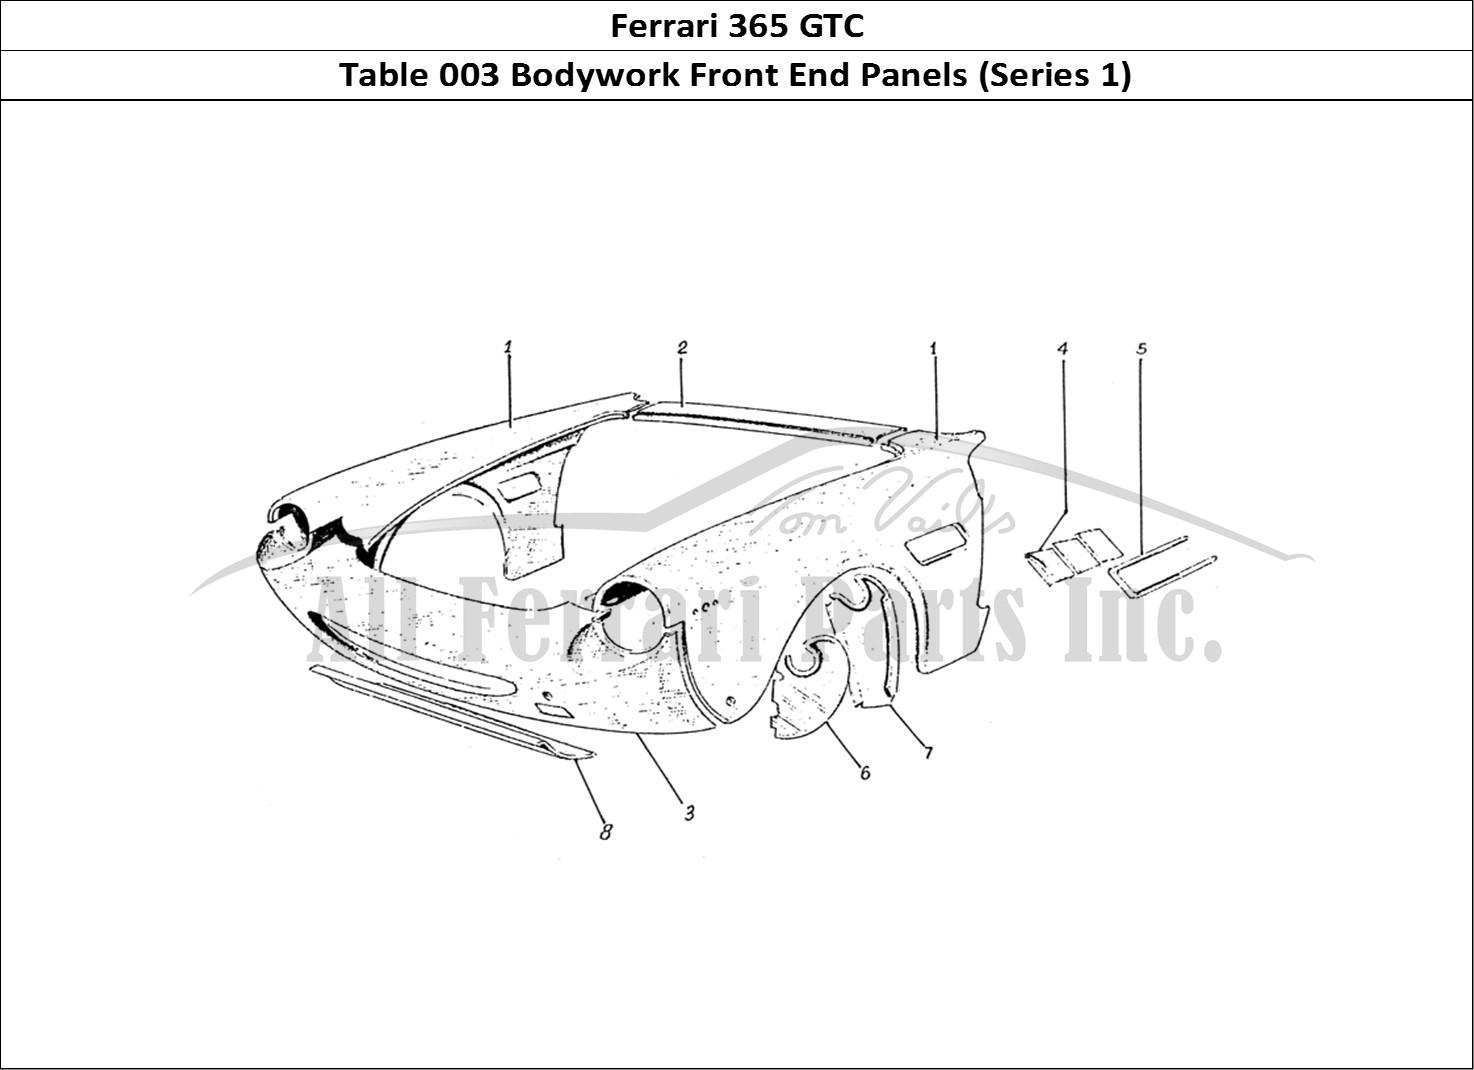 Buy Original Ferrari 365 Gtc 003 Bodywork Front End Panels